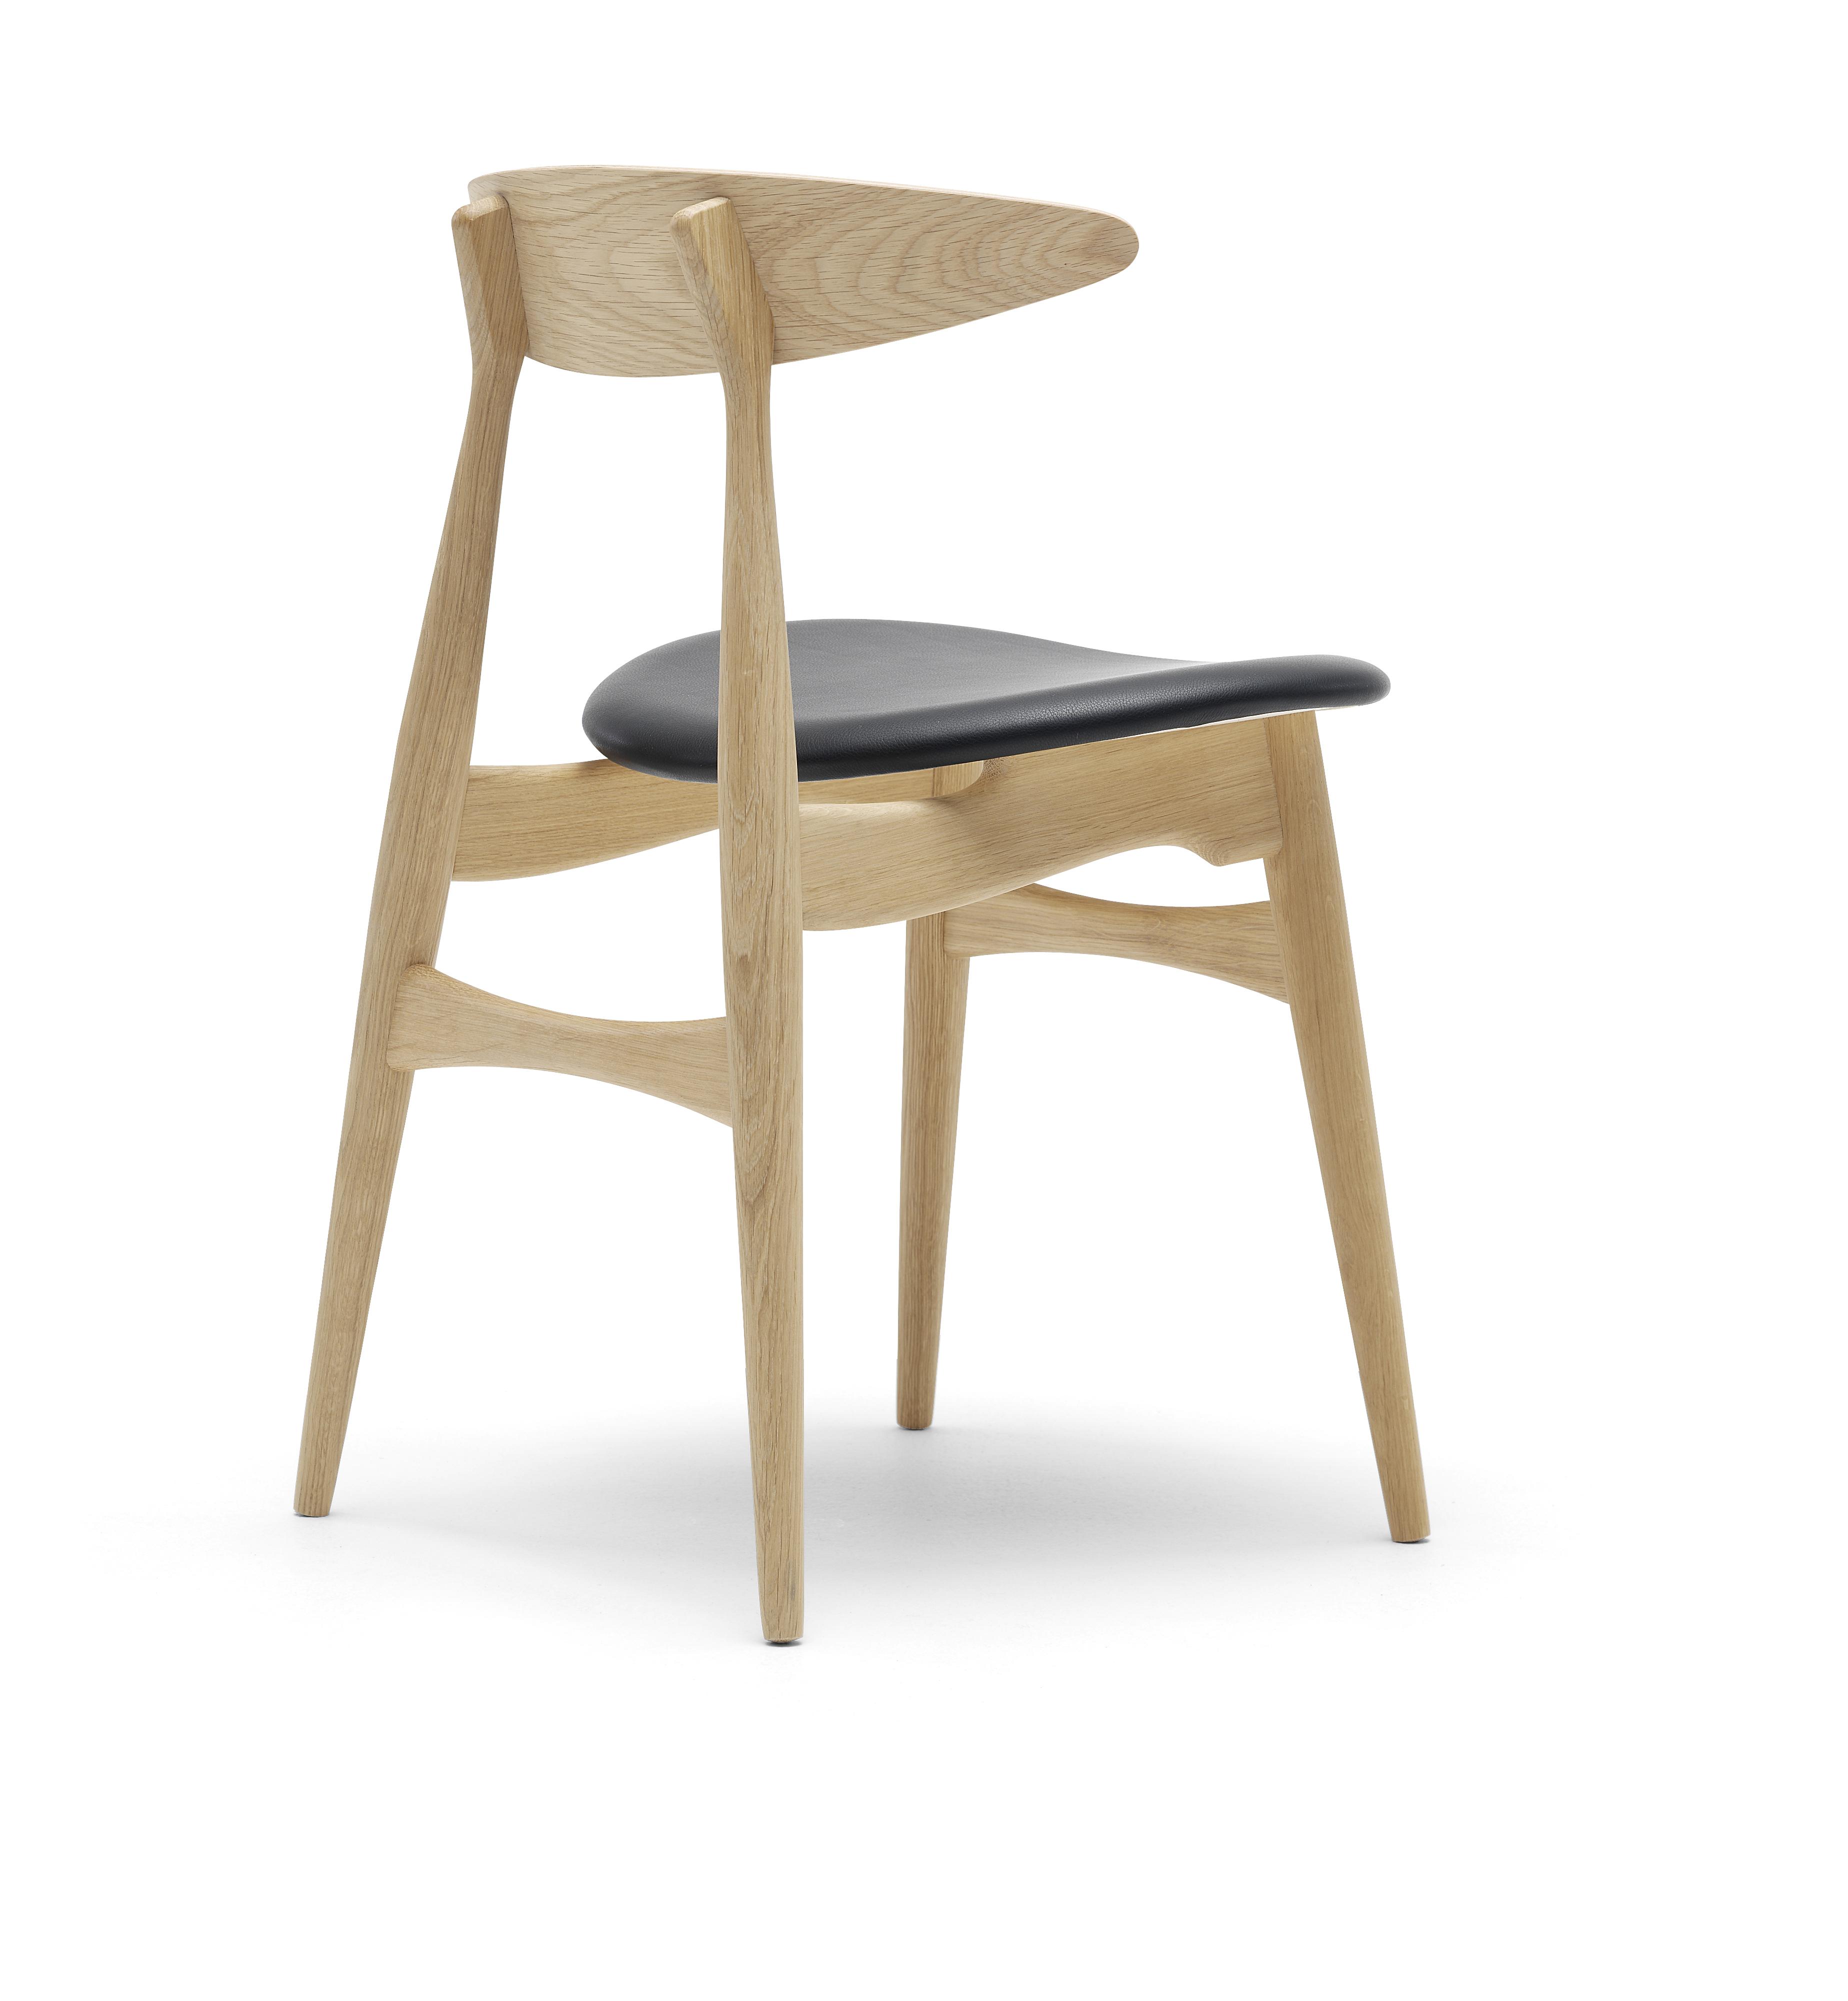 chaise ch33 carl hansen son. Black Bedroom Furniture Sets. Home Design Ideas